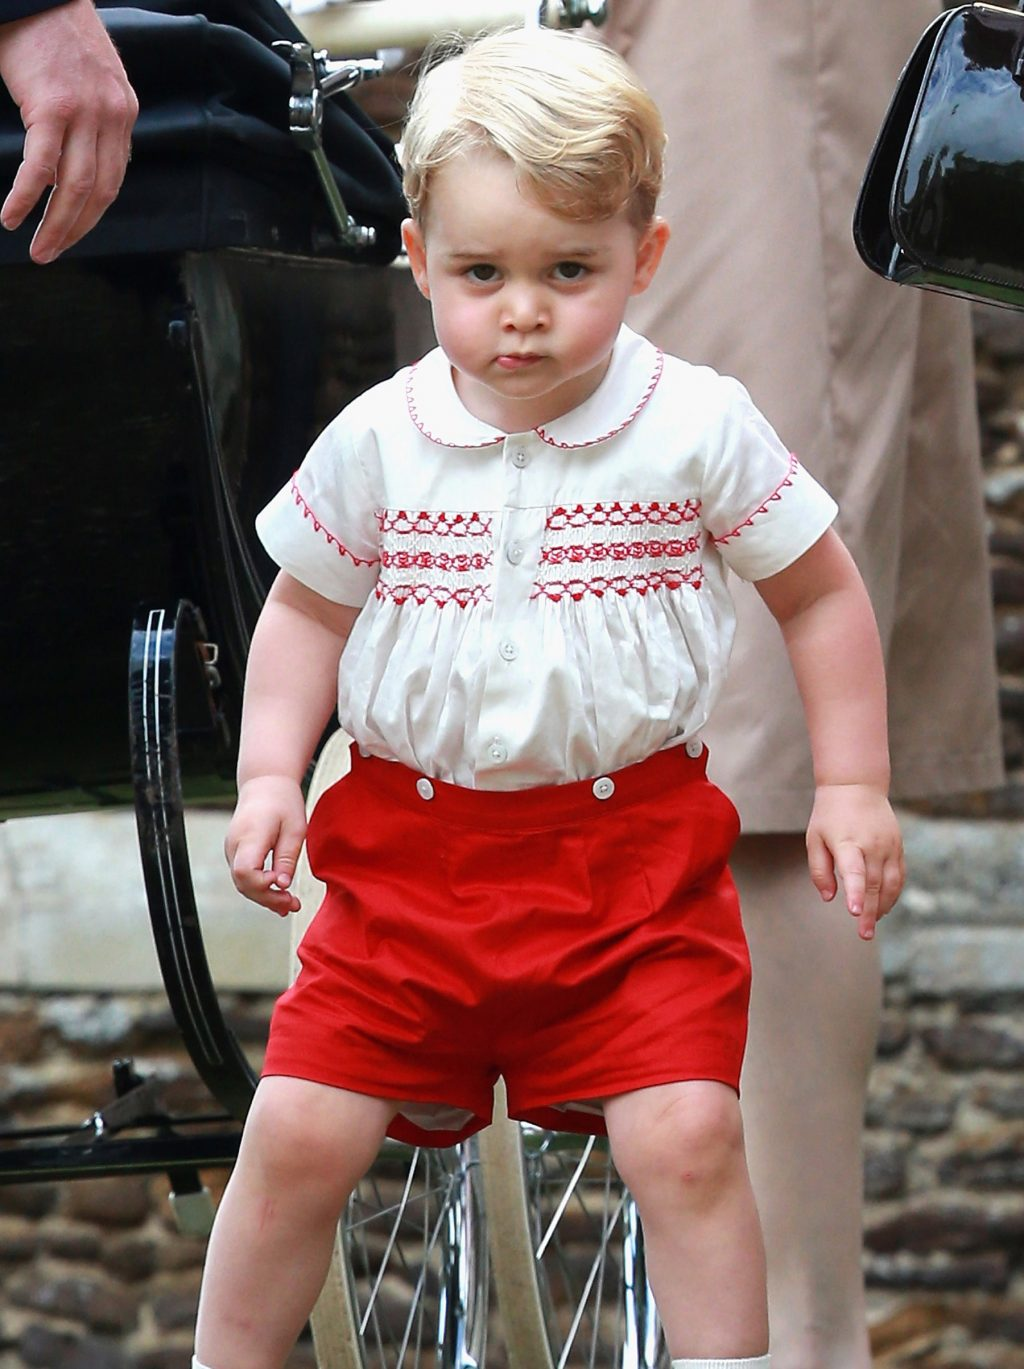 hoàng tử george 4